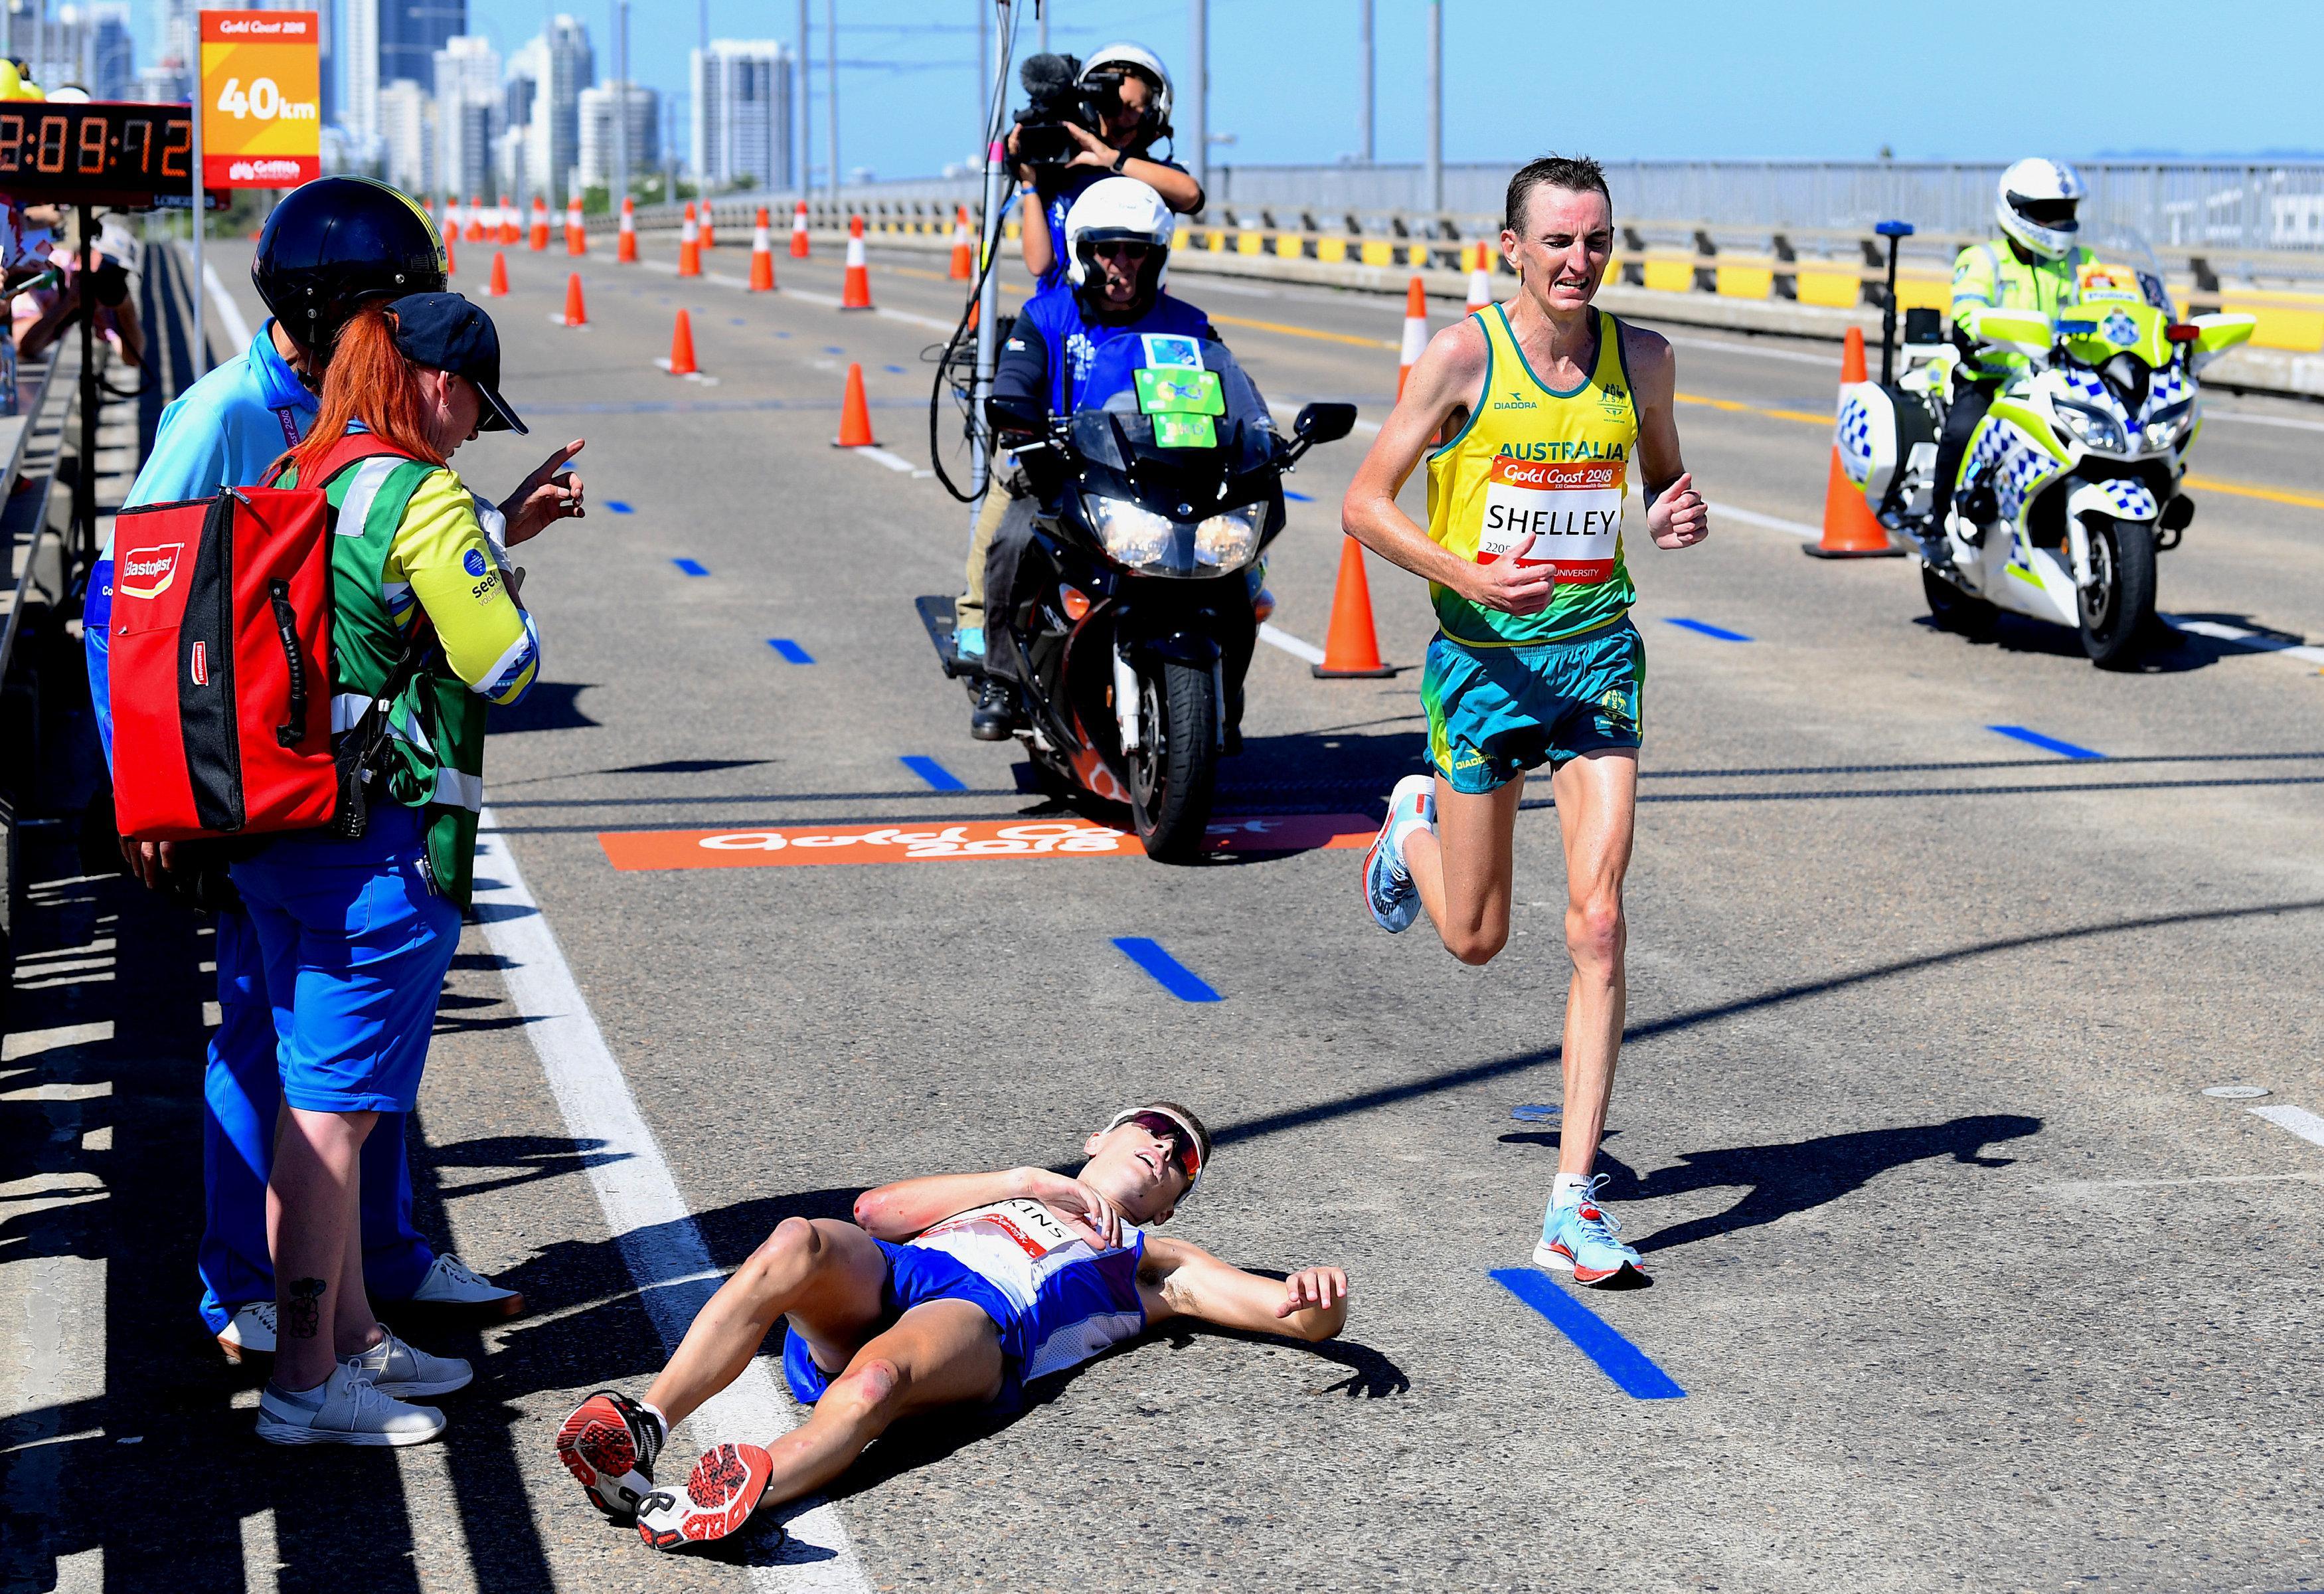 Michael Shelley runs past collapsed Callum Hawkins